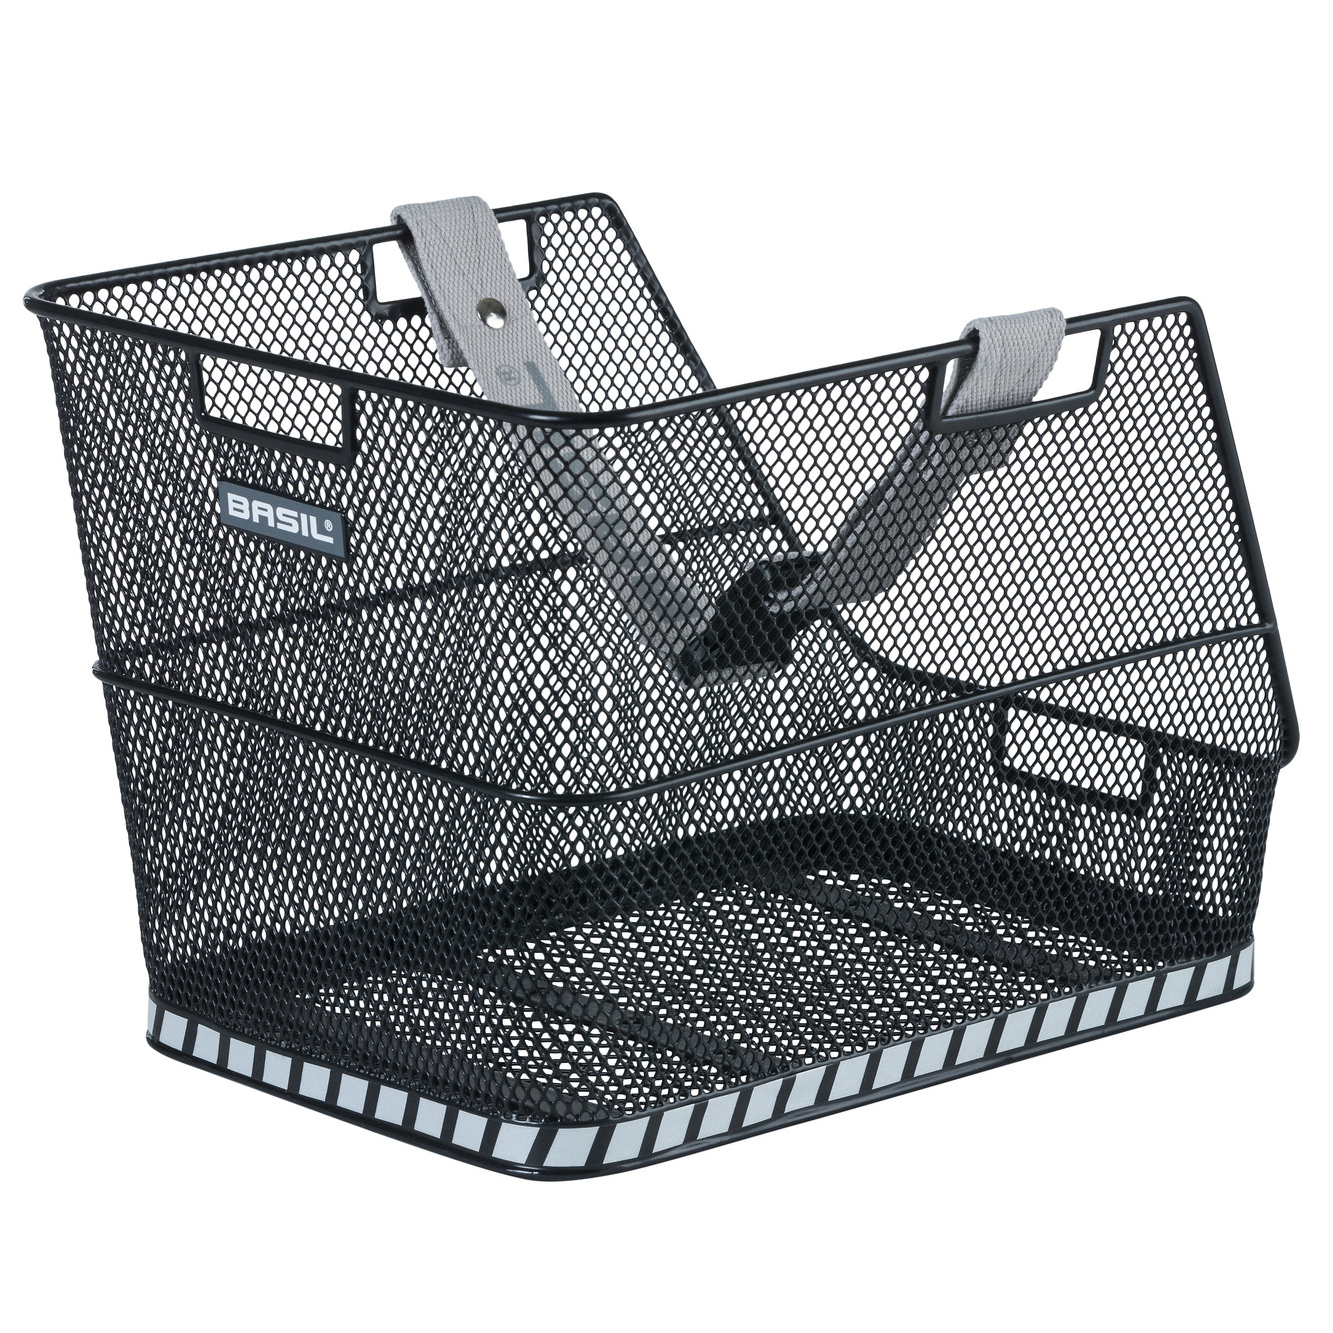 Basil Class Rear School Bag Basket - black